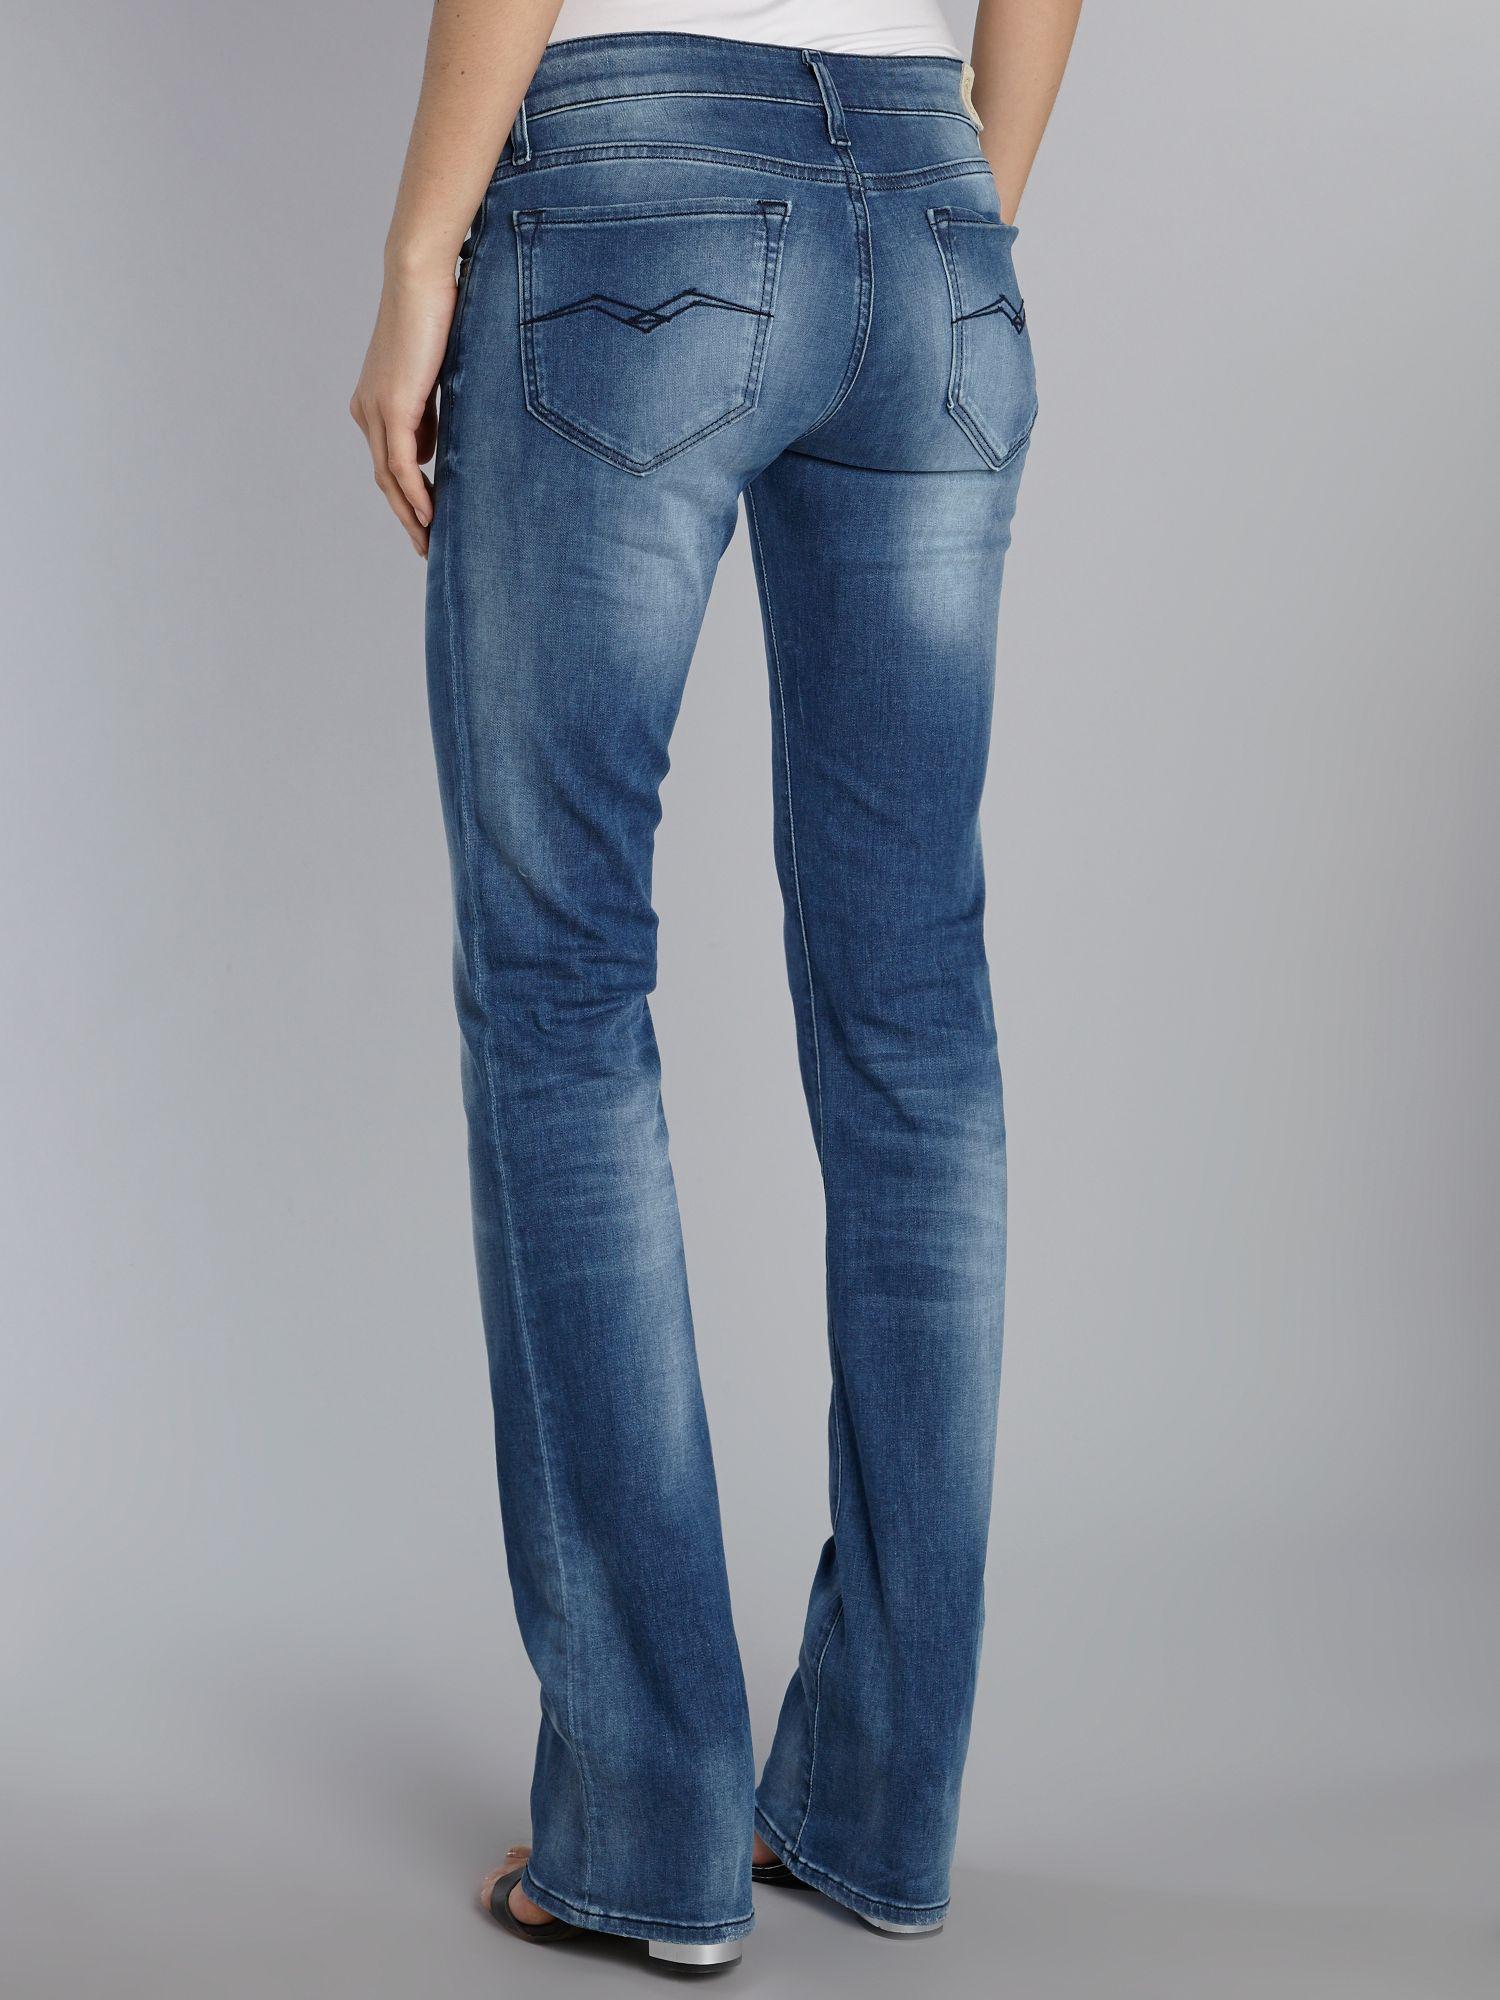 replay bootcut jeans - Jean Yu Beauty